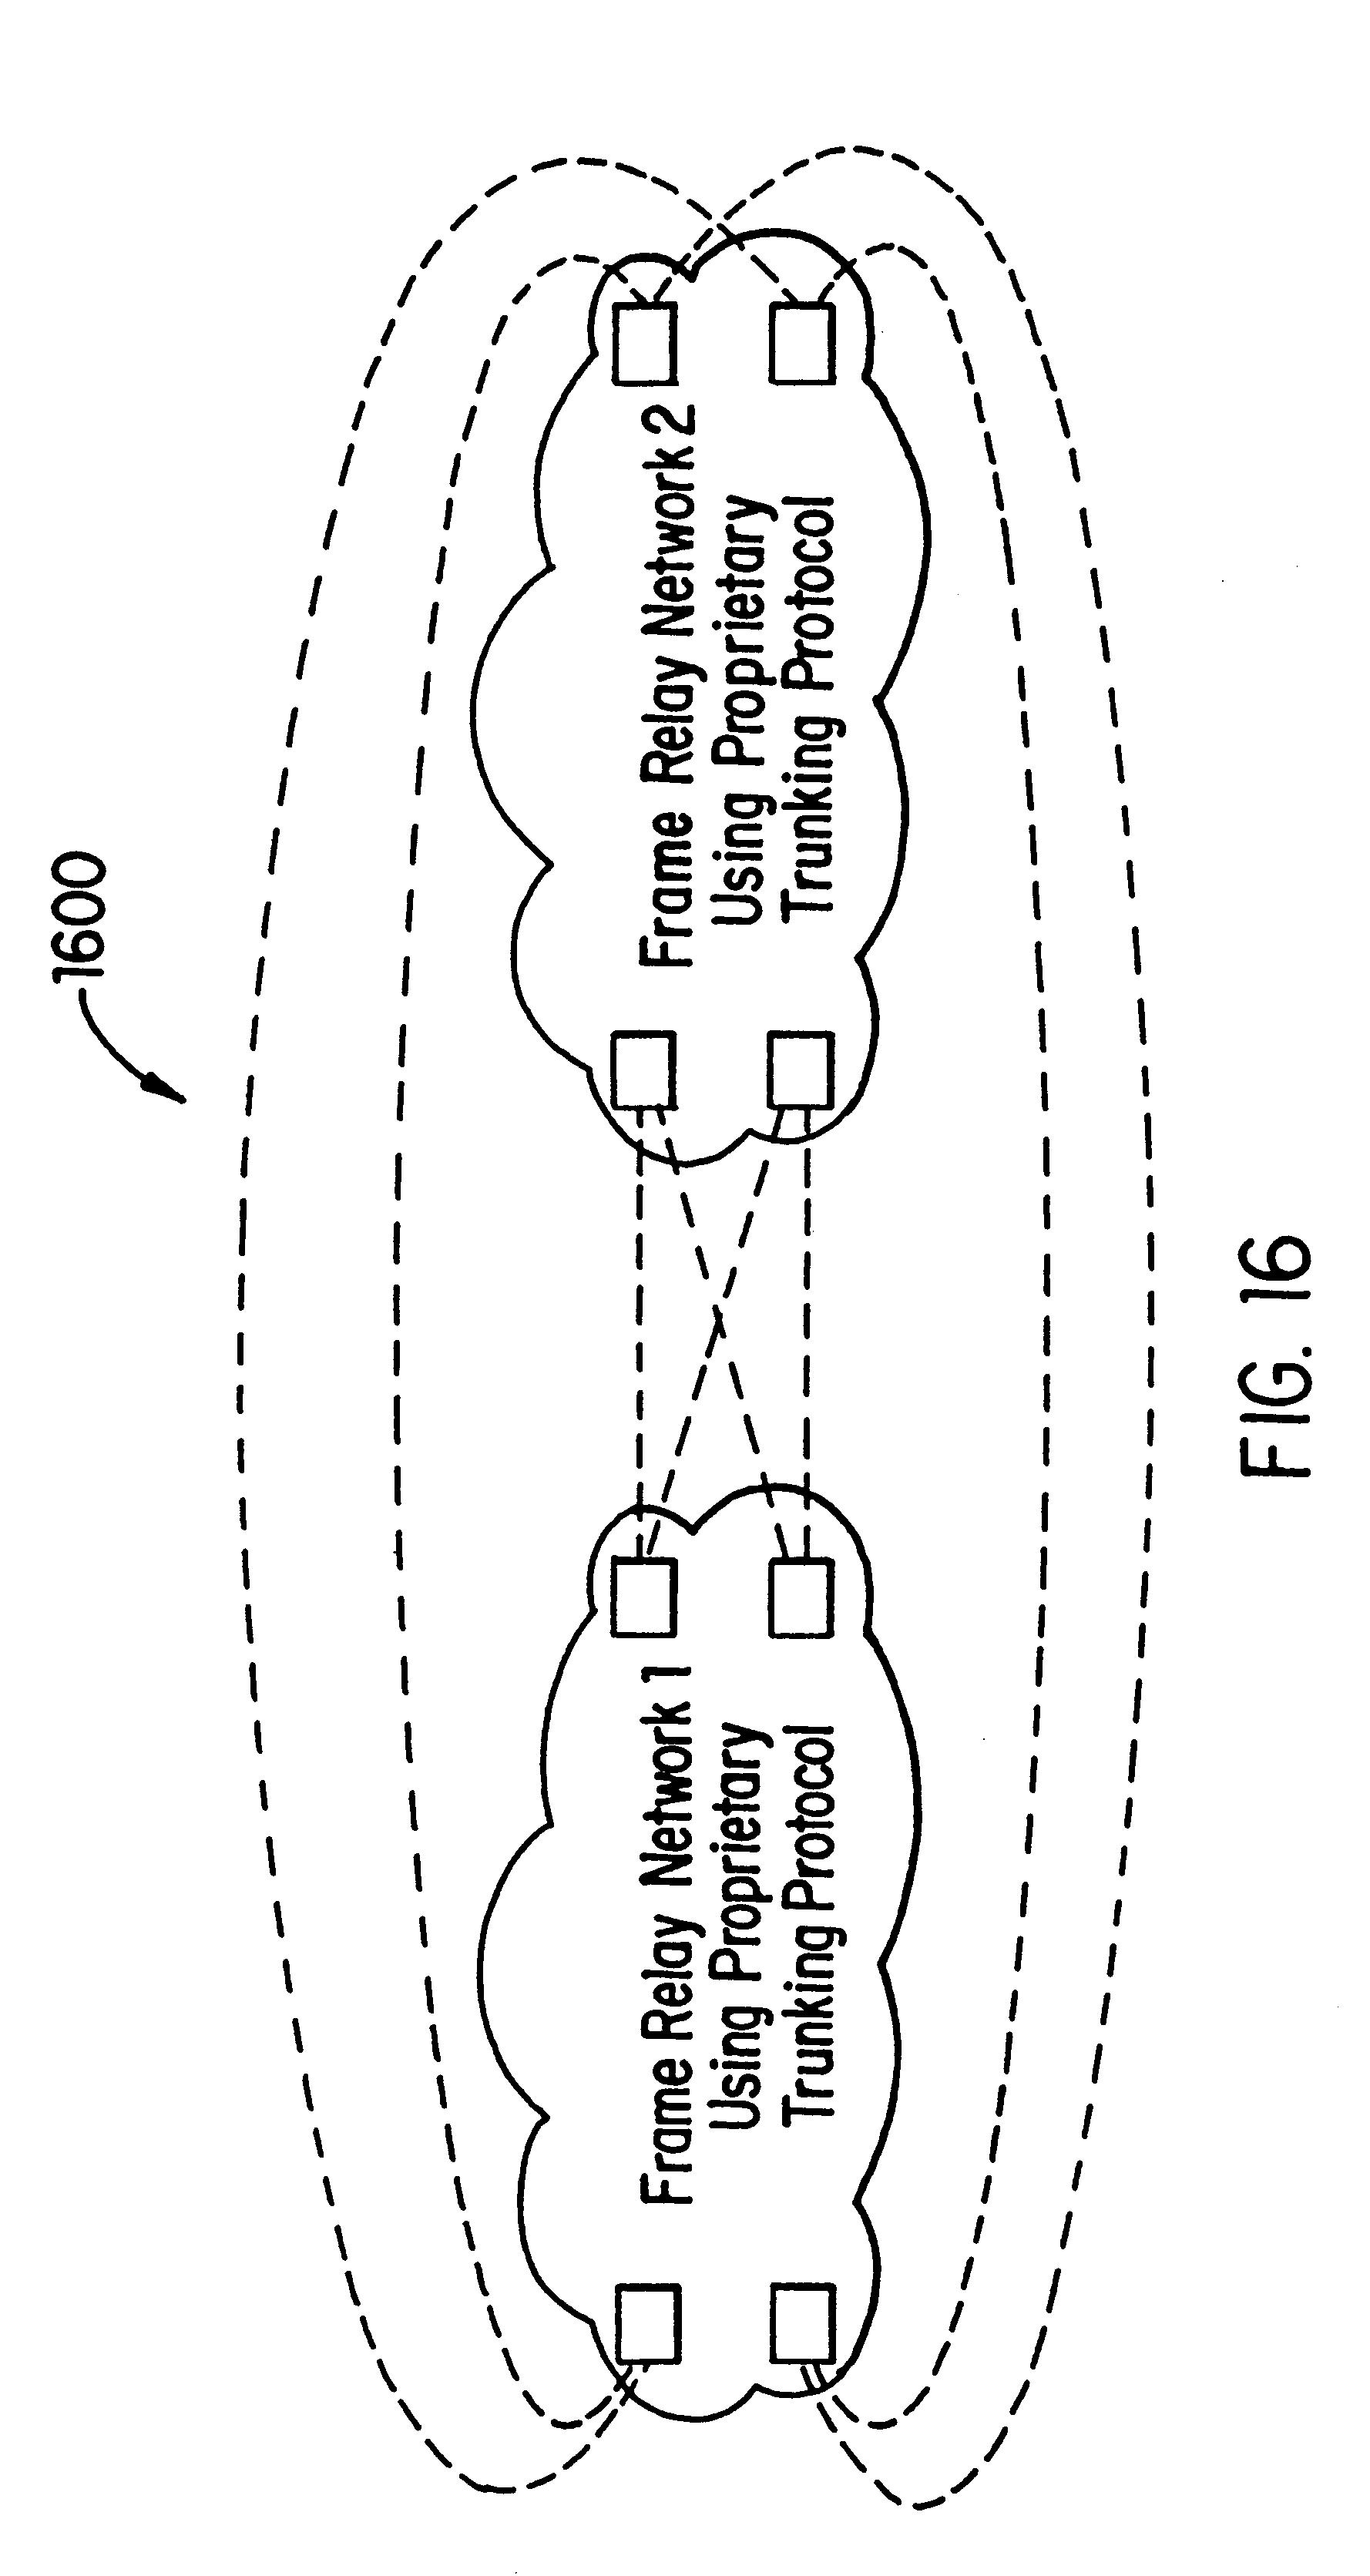 patente us6226260